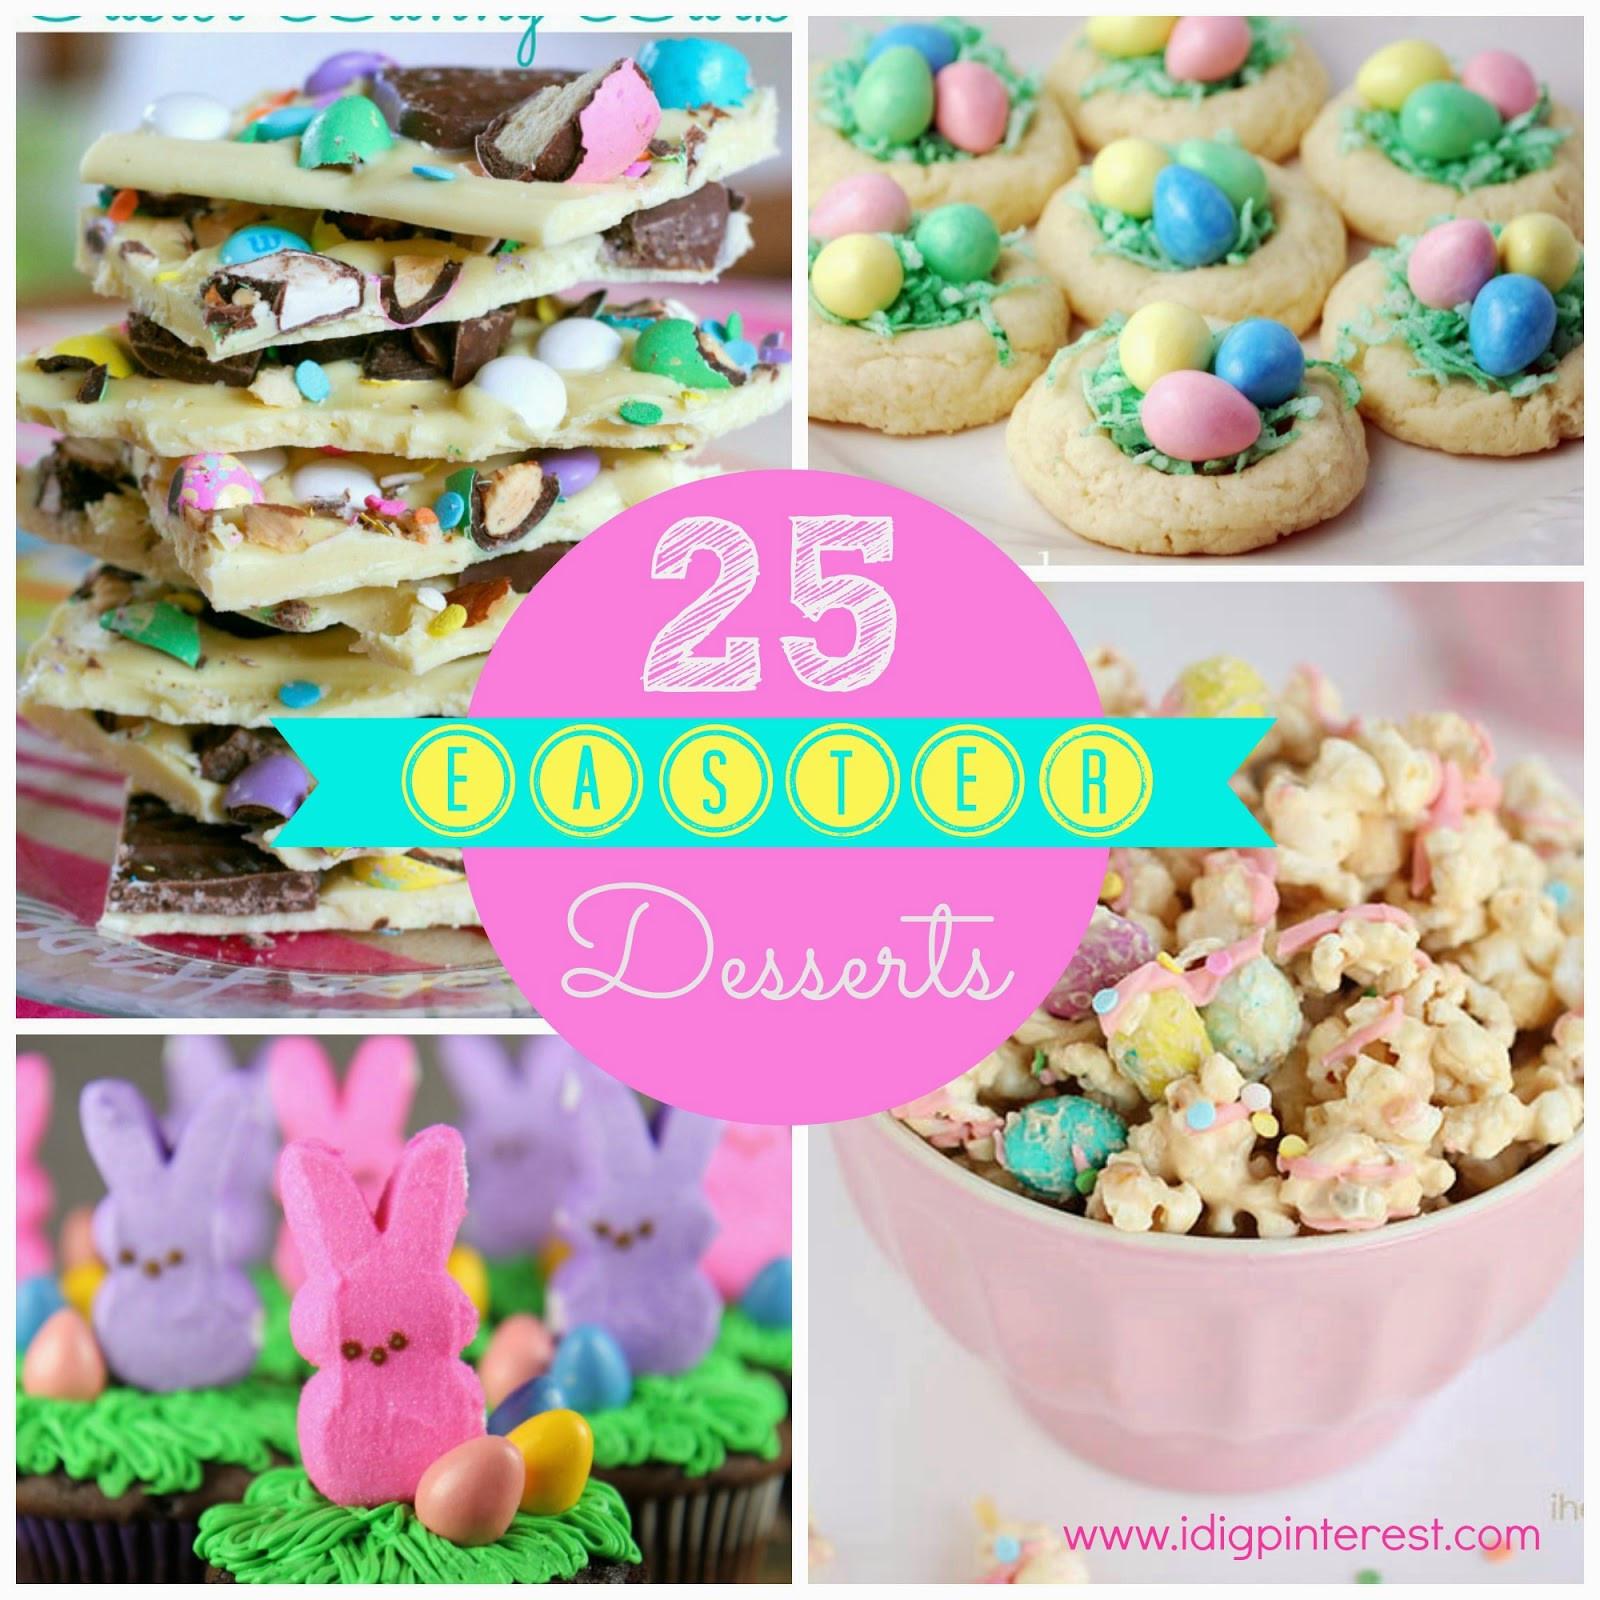 Yummy Easter Desserts  25 Pretty & Yummy Easter Desserts I Dig Pinterest